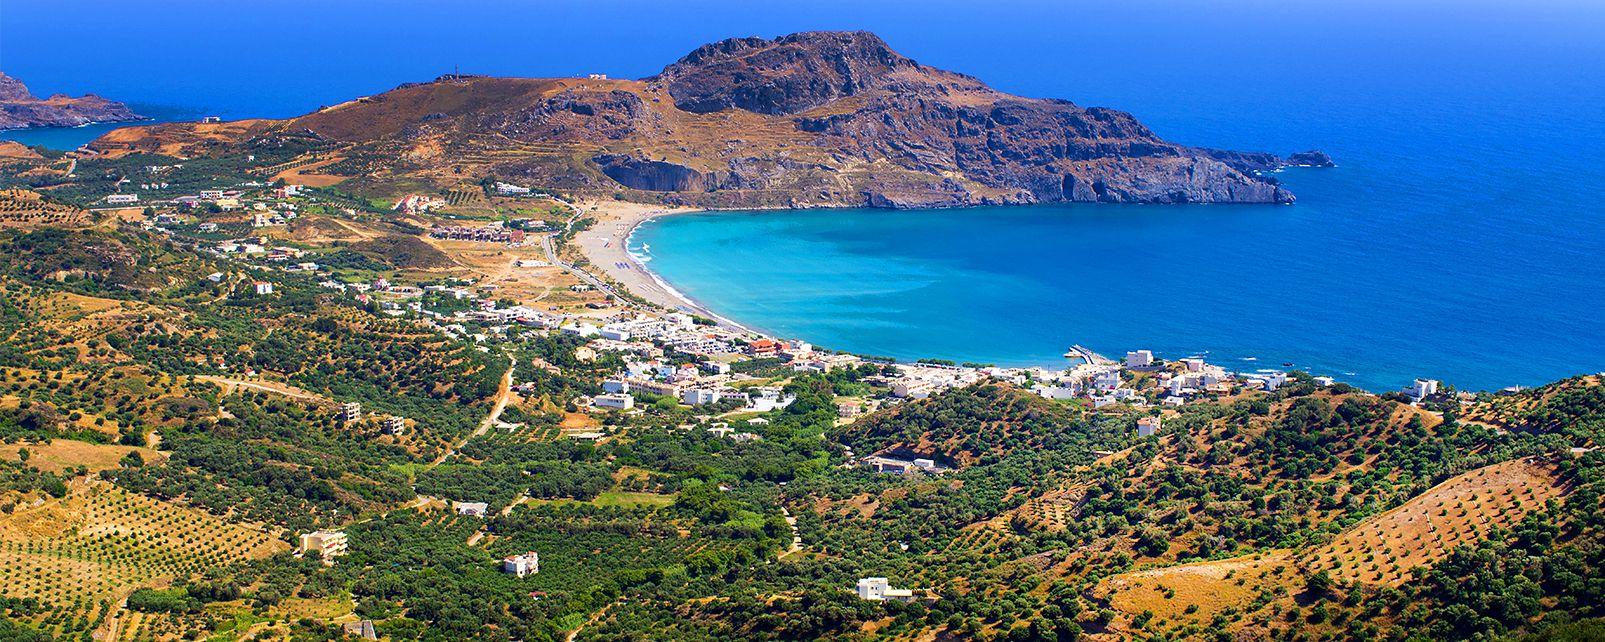 La costa sur, Las costas, Creta